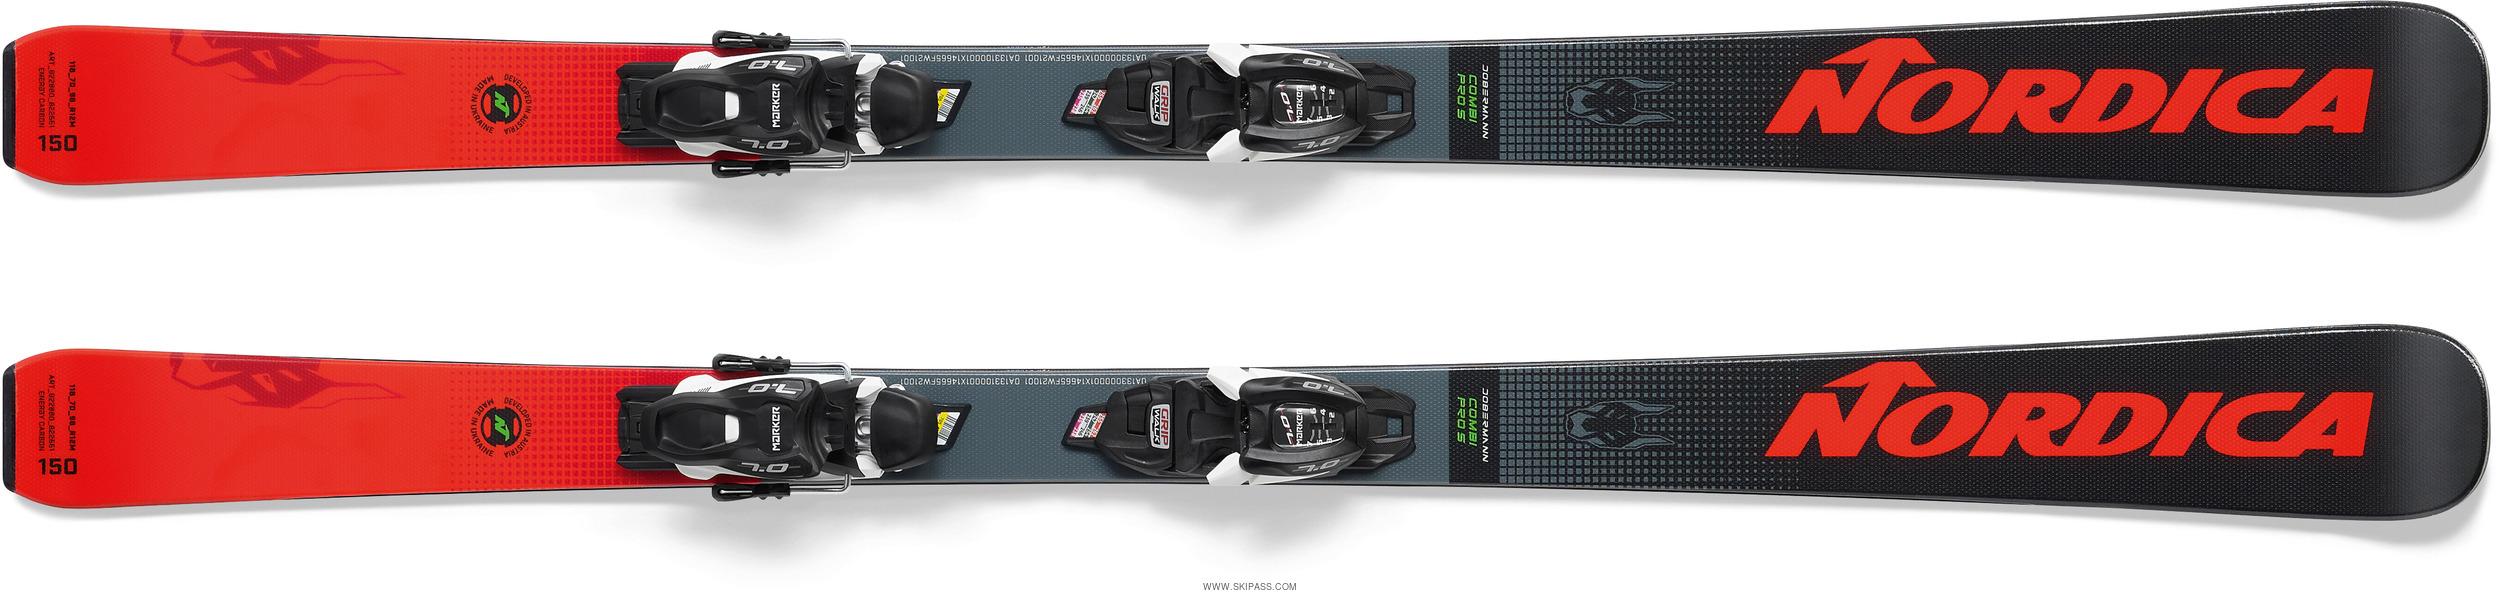 Nordica Dobermann Combi Pro S FDT